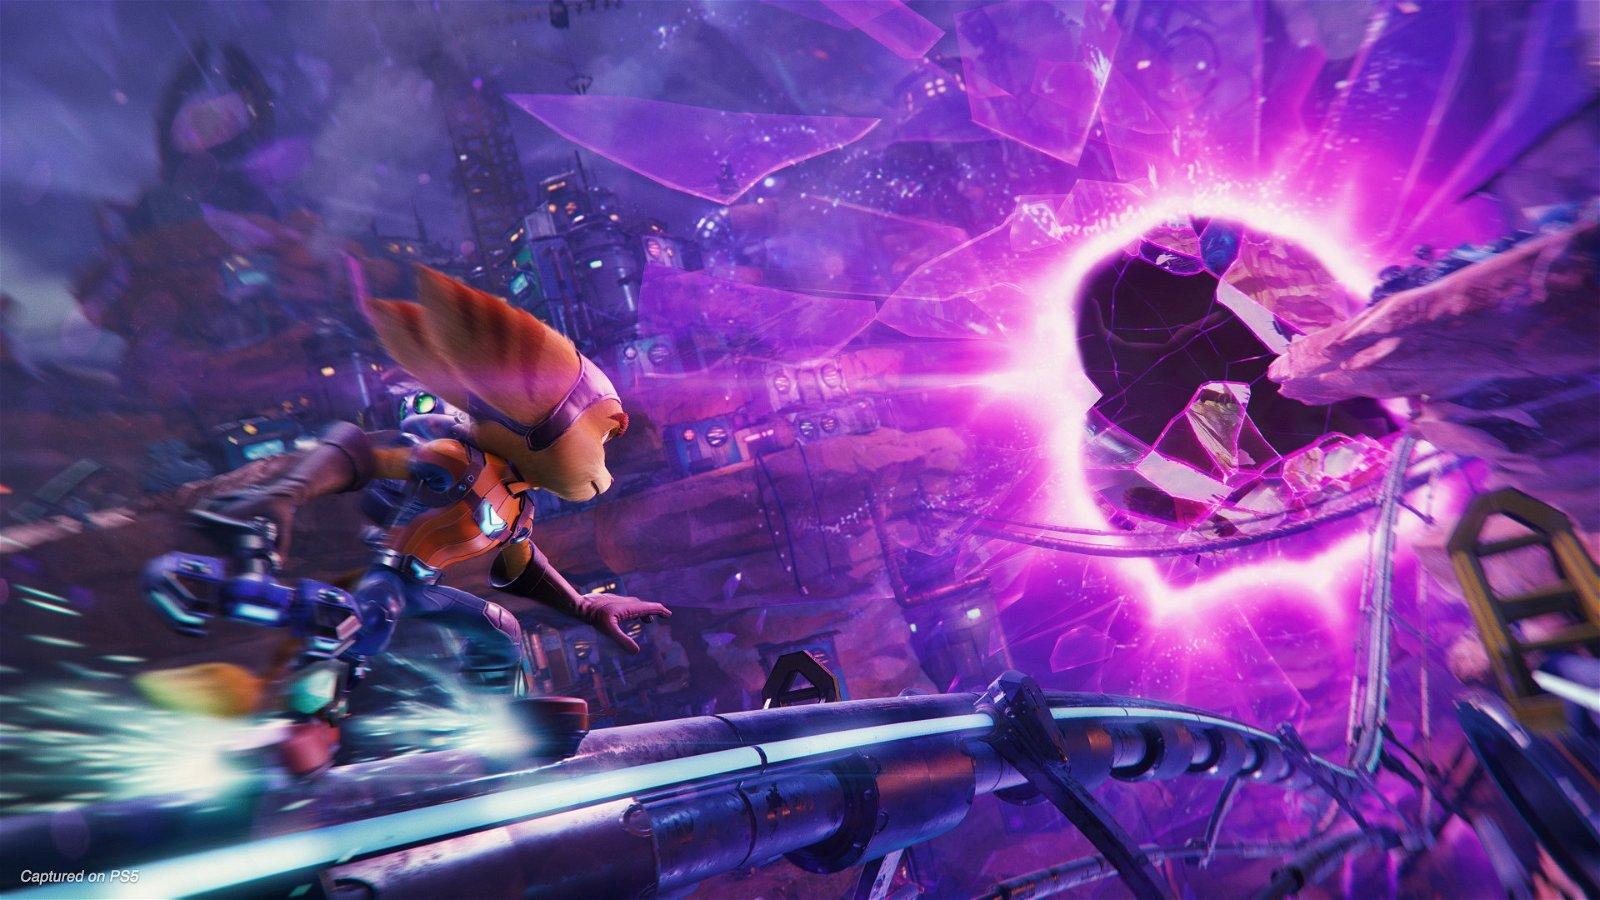 Gamescom 2020 Showcases 35 Titles on Opening Night Stream 1